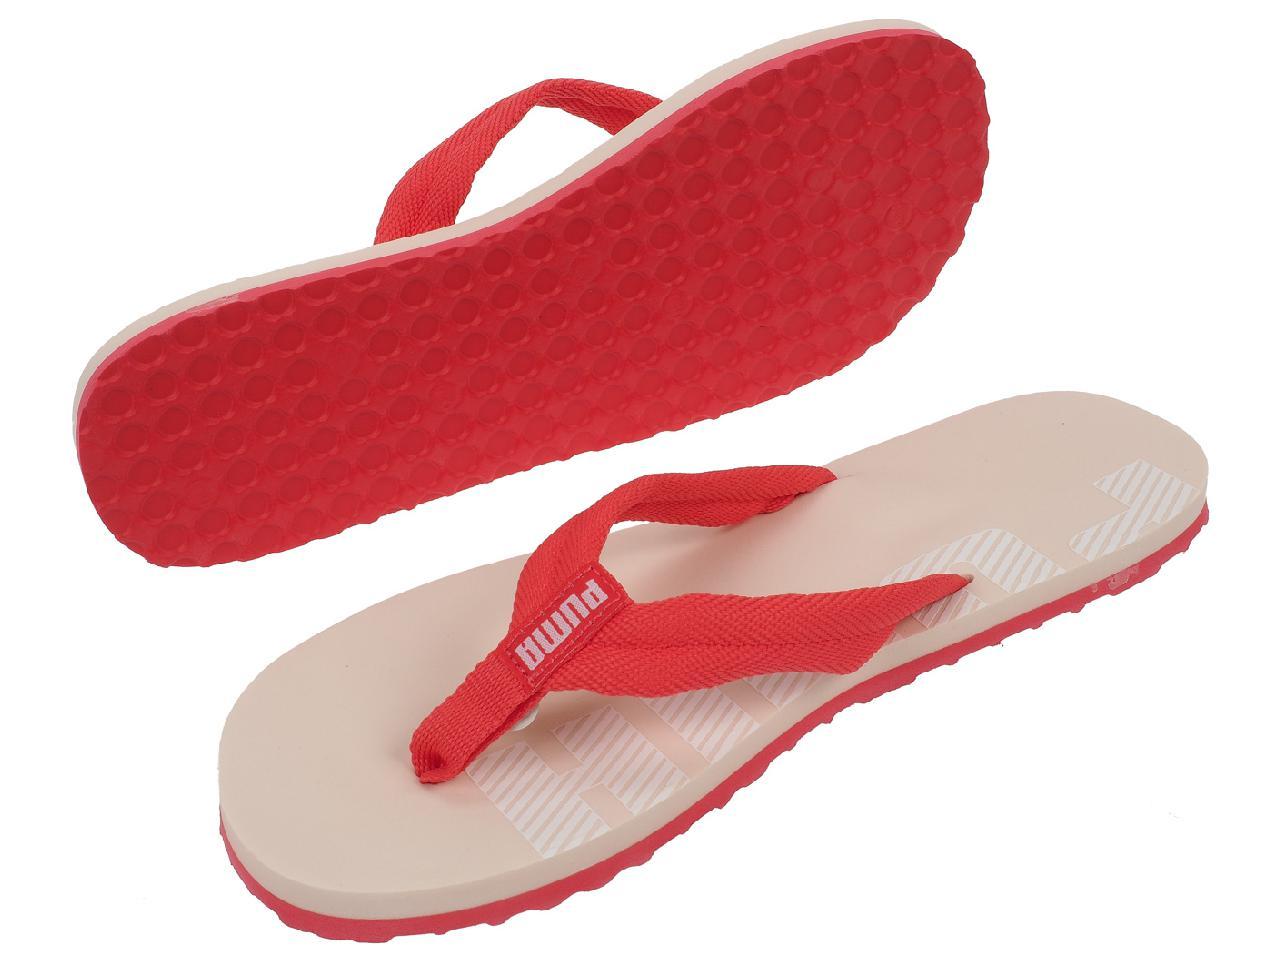 Latschen-Flip-Flops-Puma-Epic-Flip-v2-Rosa-Flip-Flops-G-Rosa-44775-Neu Indexbild 4